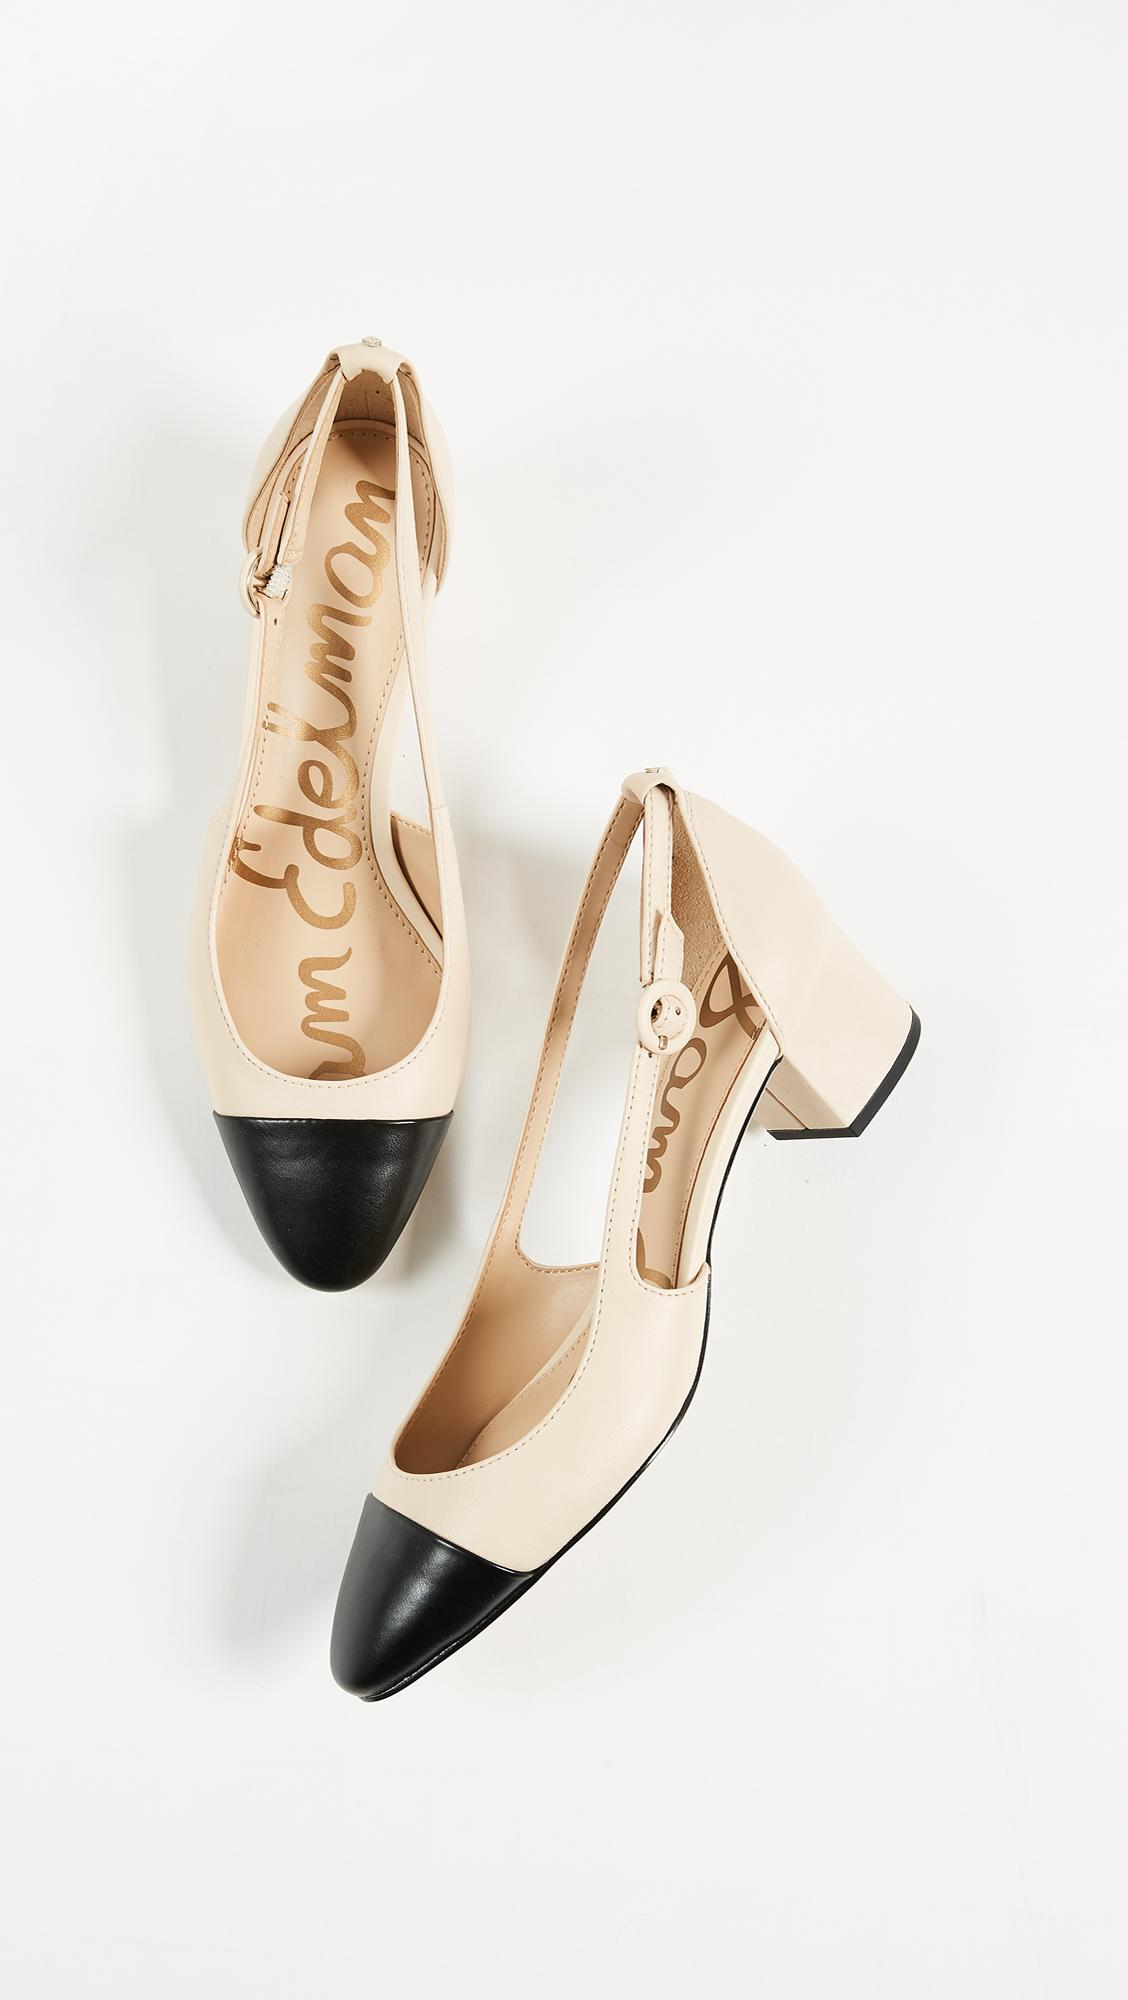 Sam Edelman Womens Leah Cap Toe Block Heel Pumps Beige Black Size 4